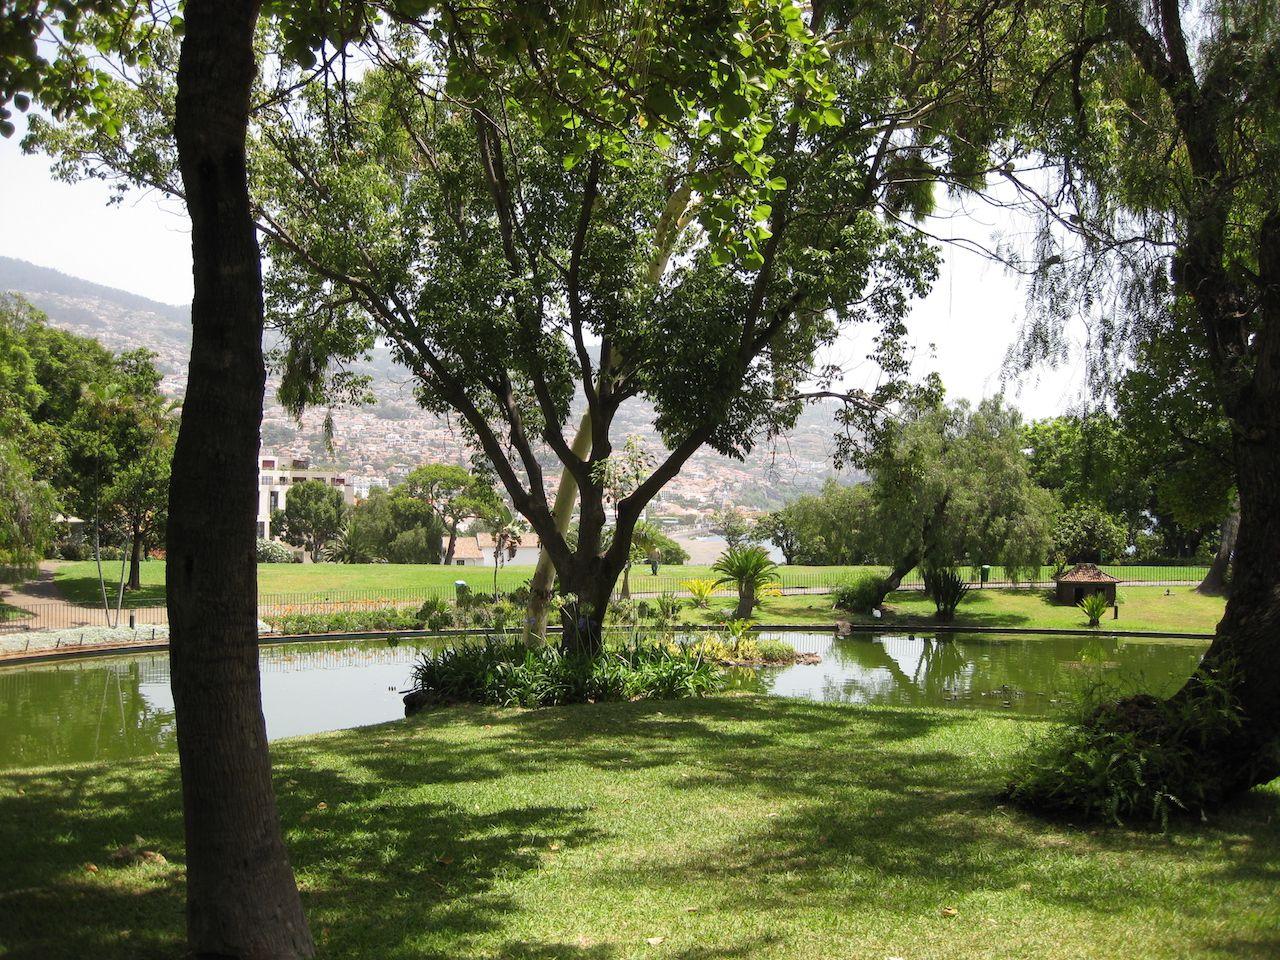 Gastcolumn | João | Verschenen op Portugal-vakantie